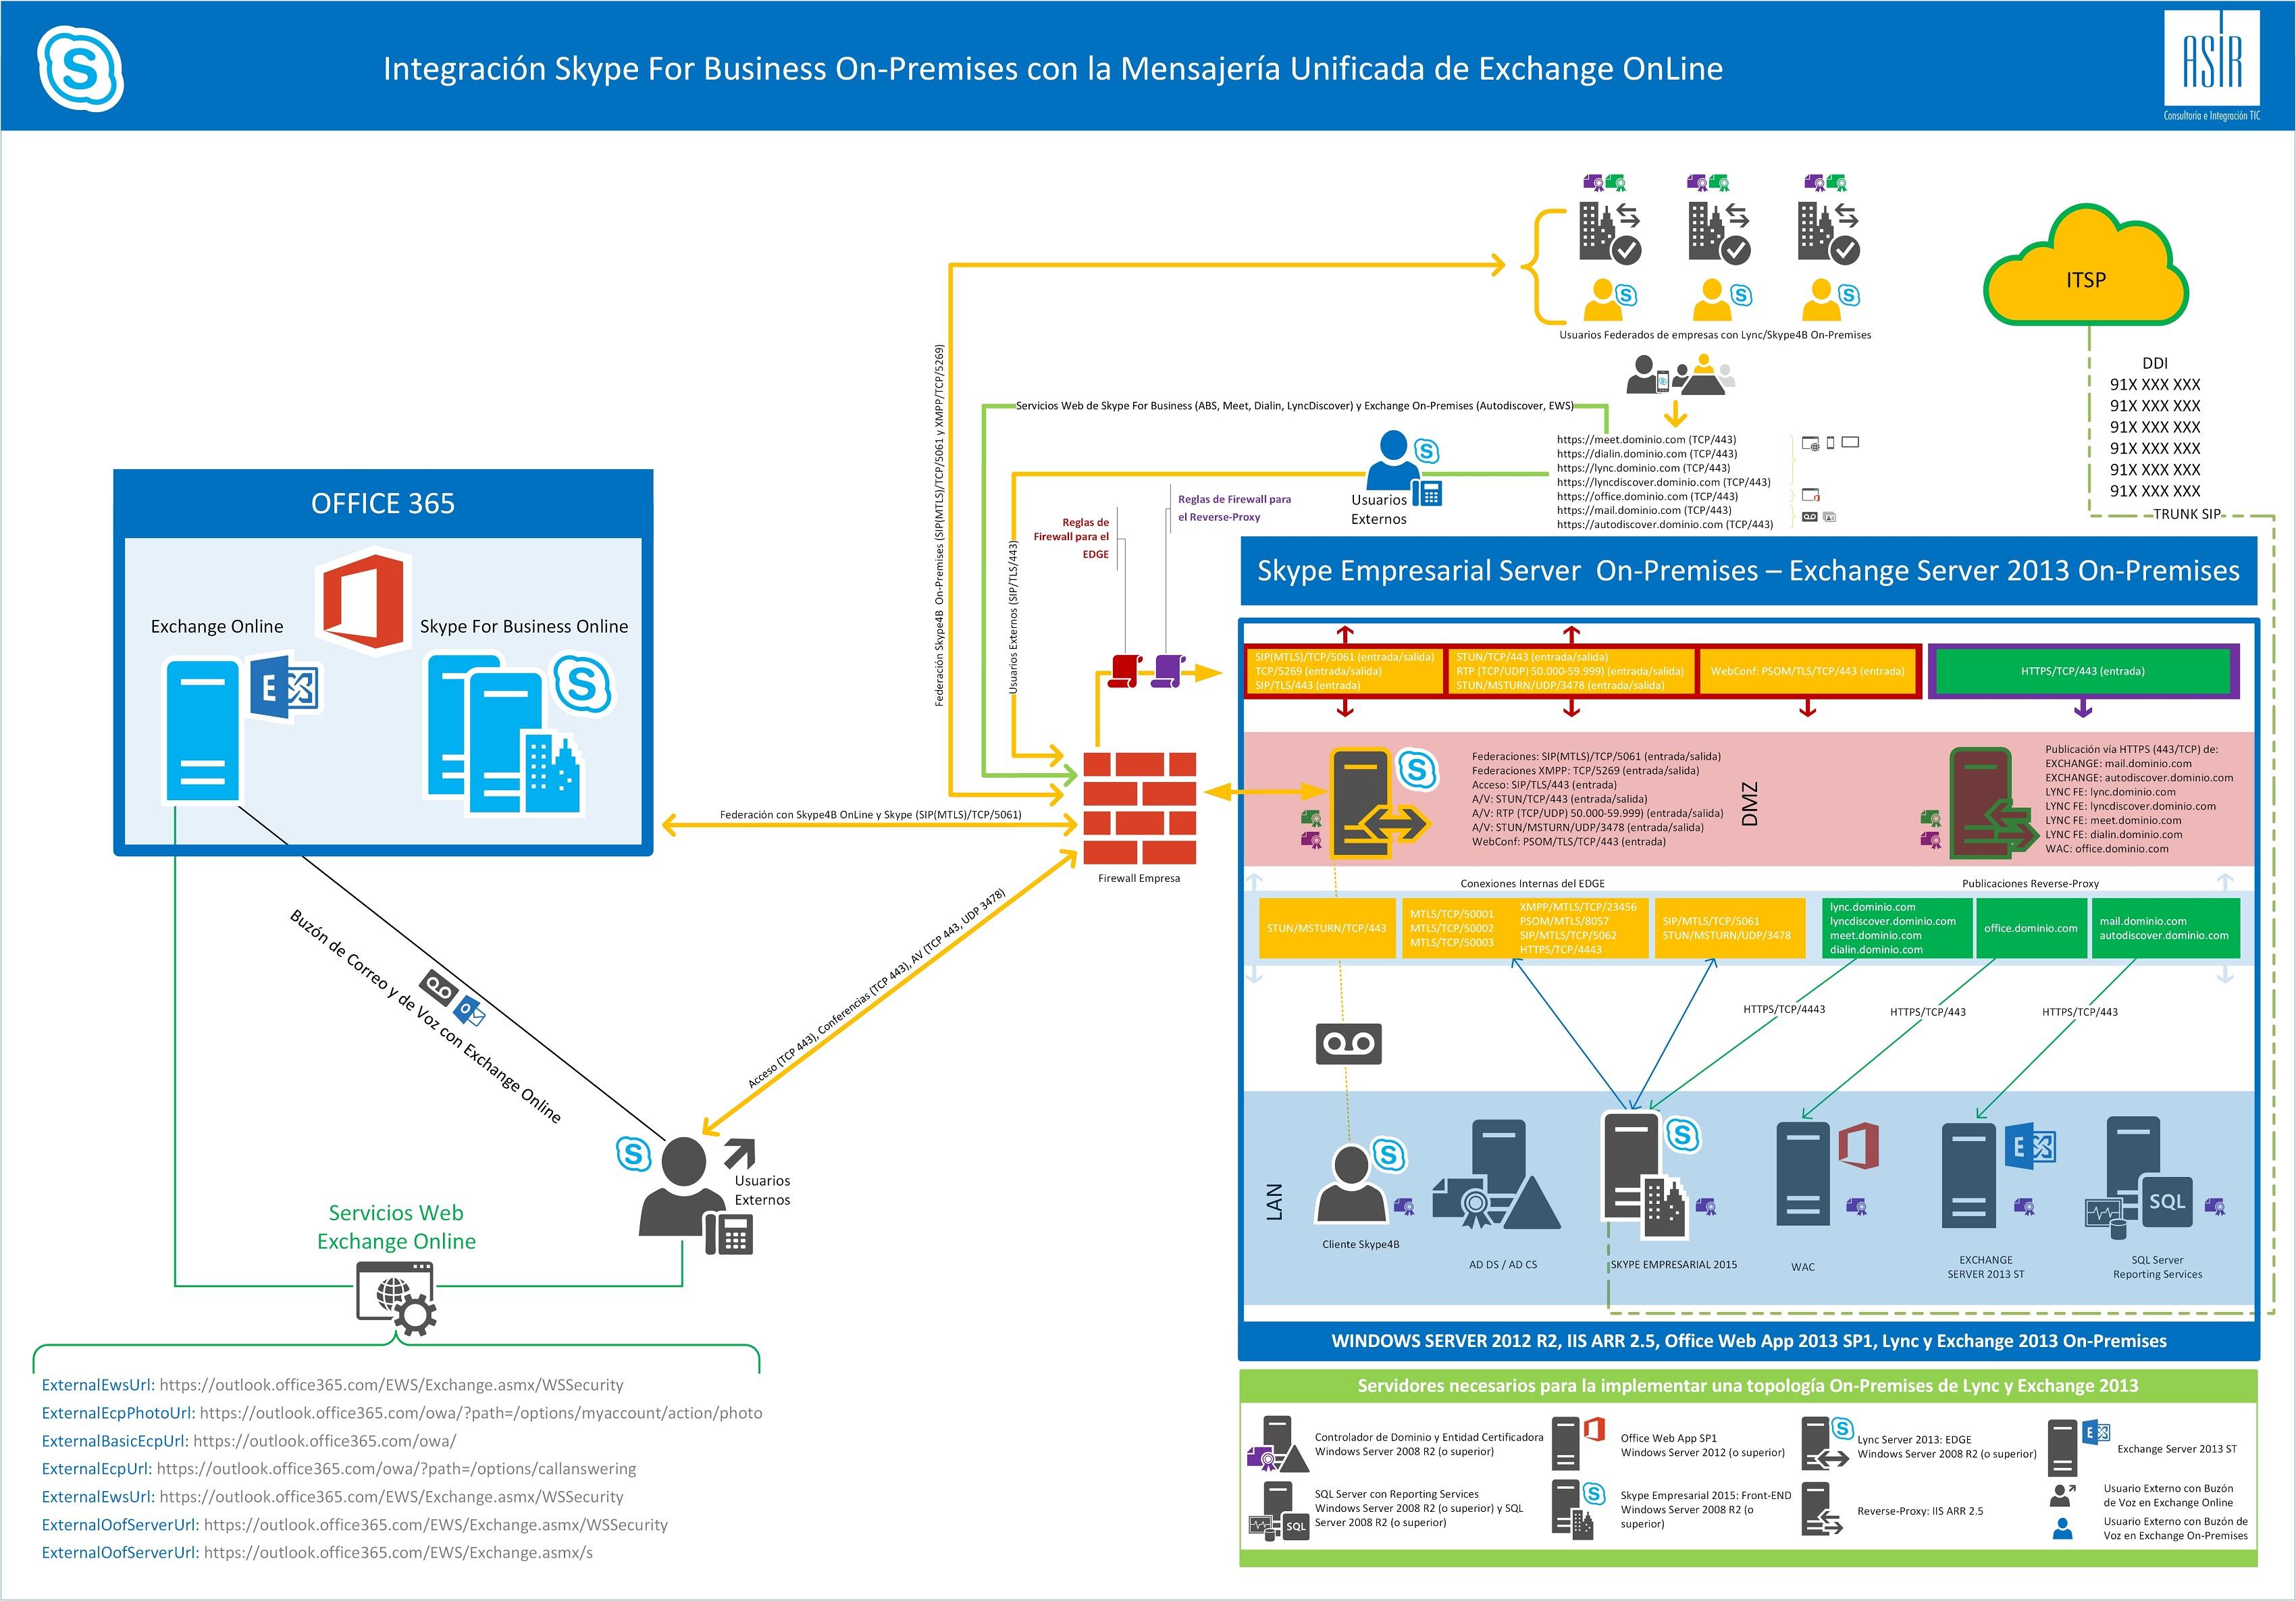 Integracion Skype4B OP con UM OnLine.jpg